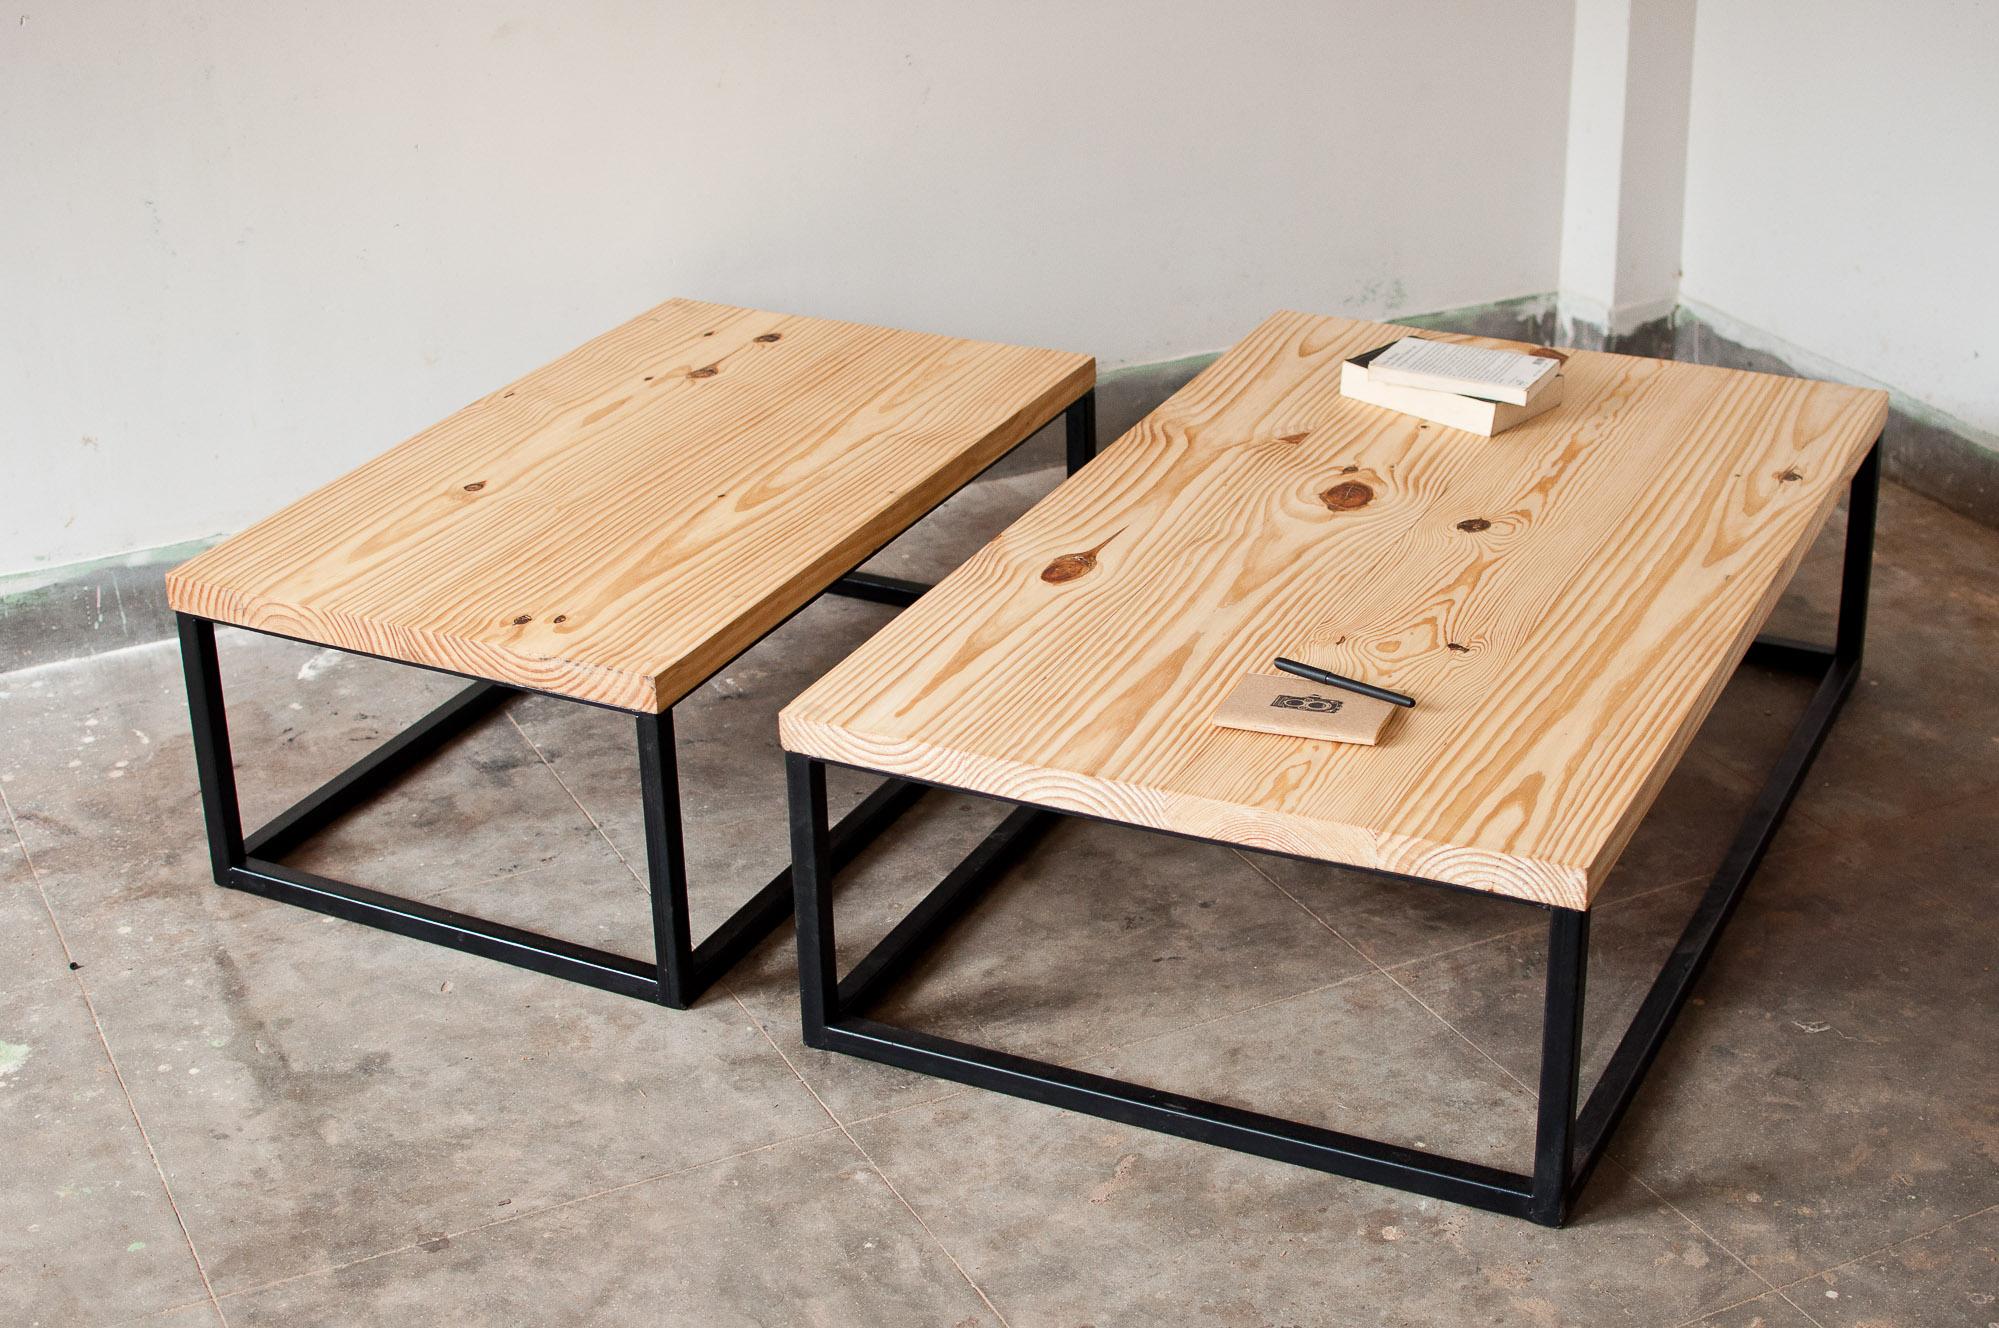 Pinewood - Small and Medium size